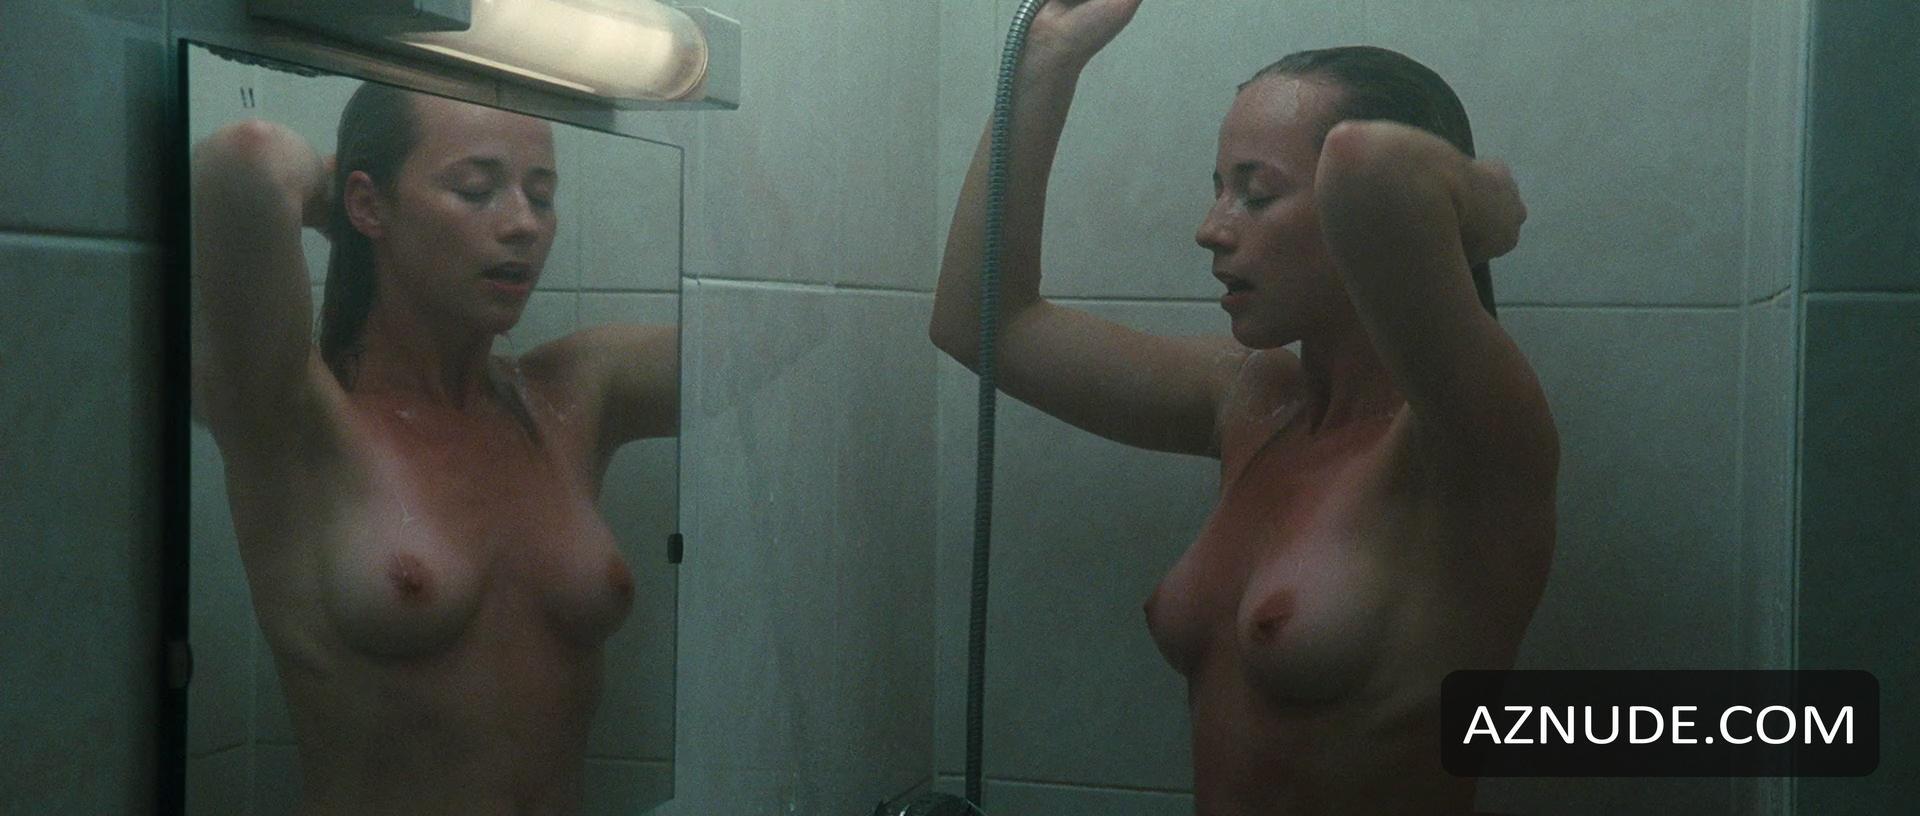 Ludivine sagnier nude sex scene in water drops on burning ro 1